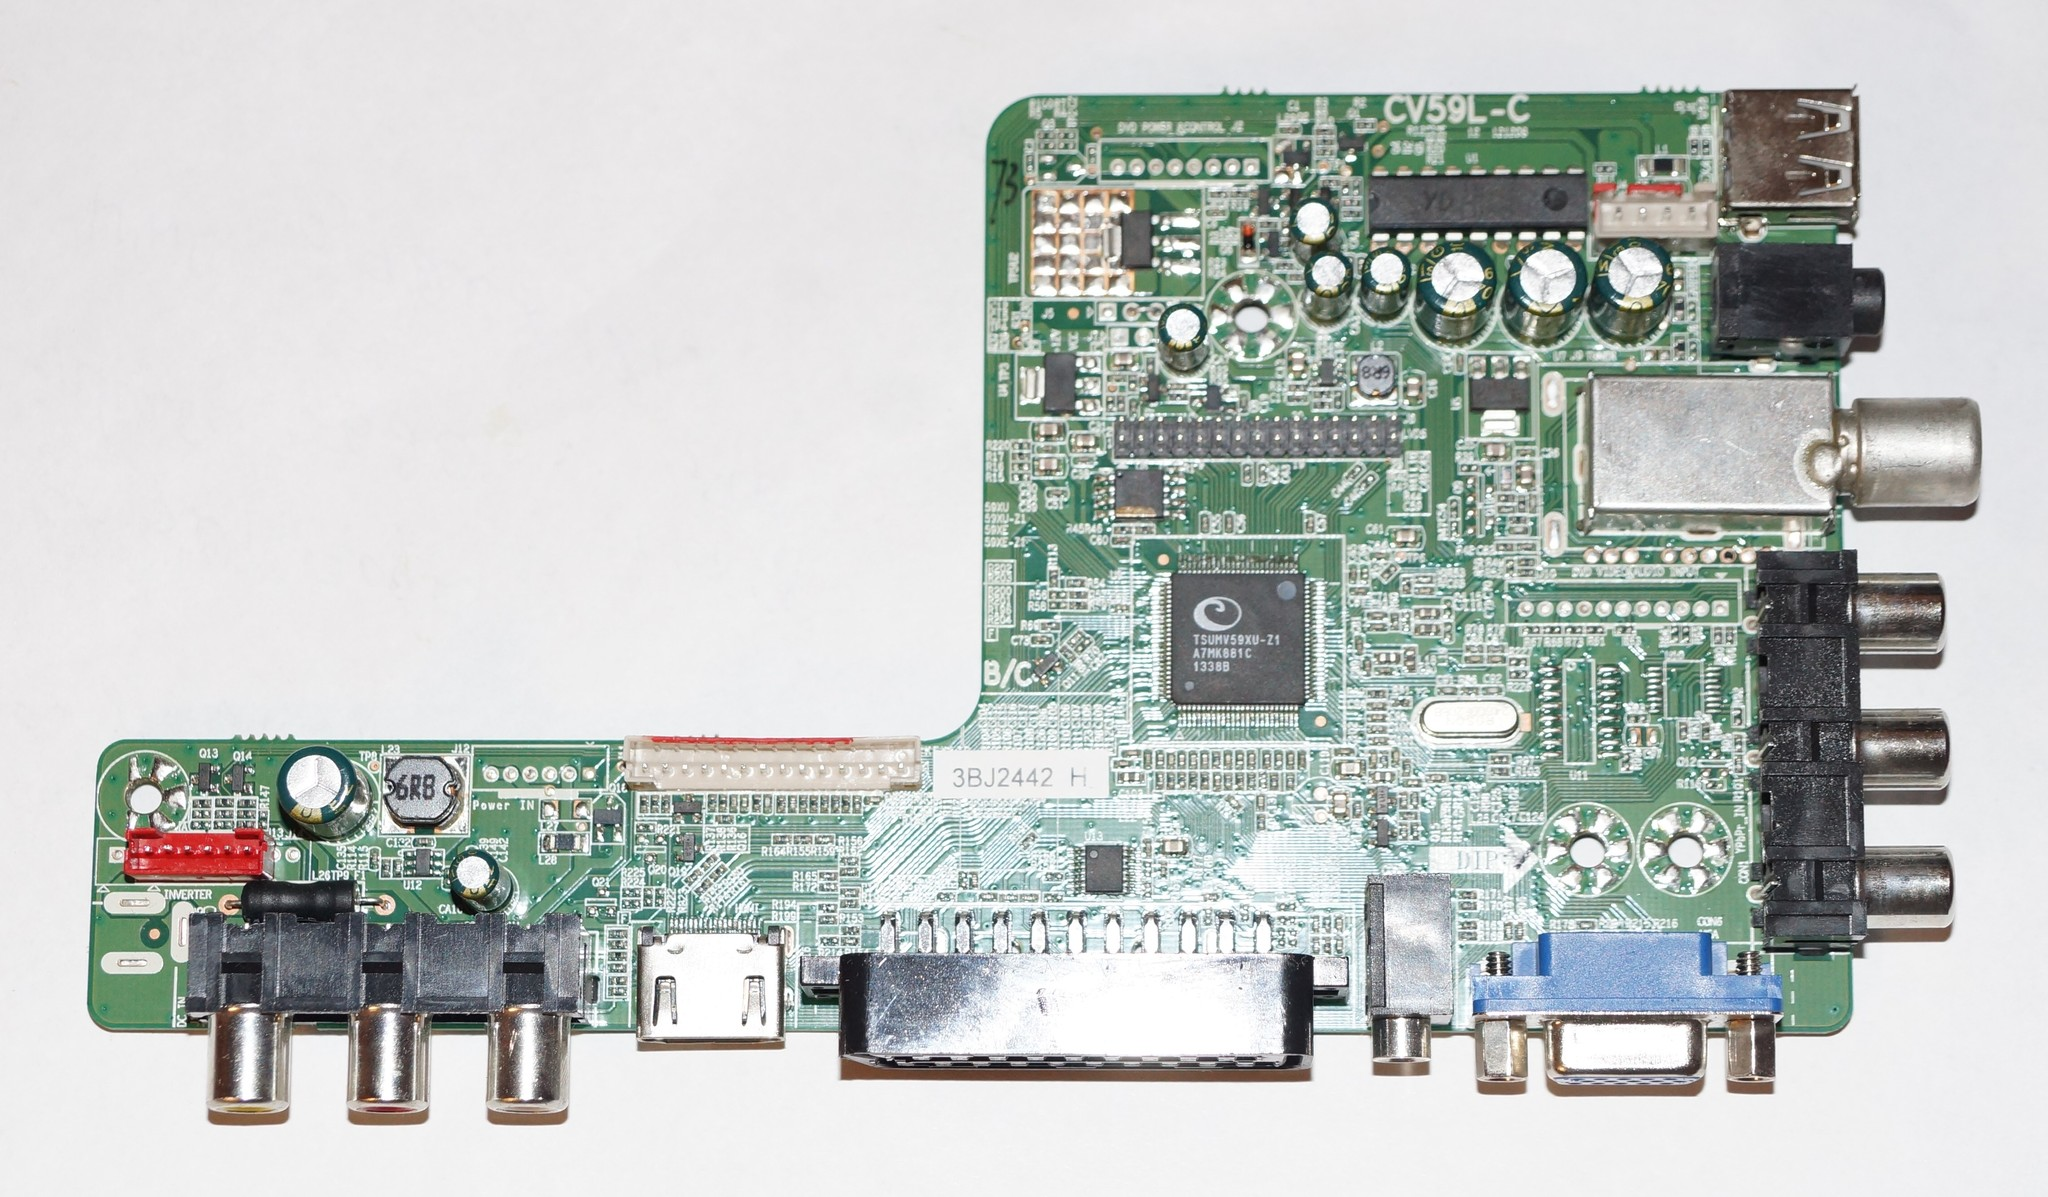 CV59L-C mainboard телевизора DNS